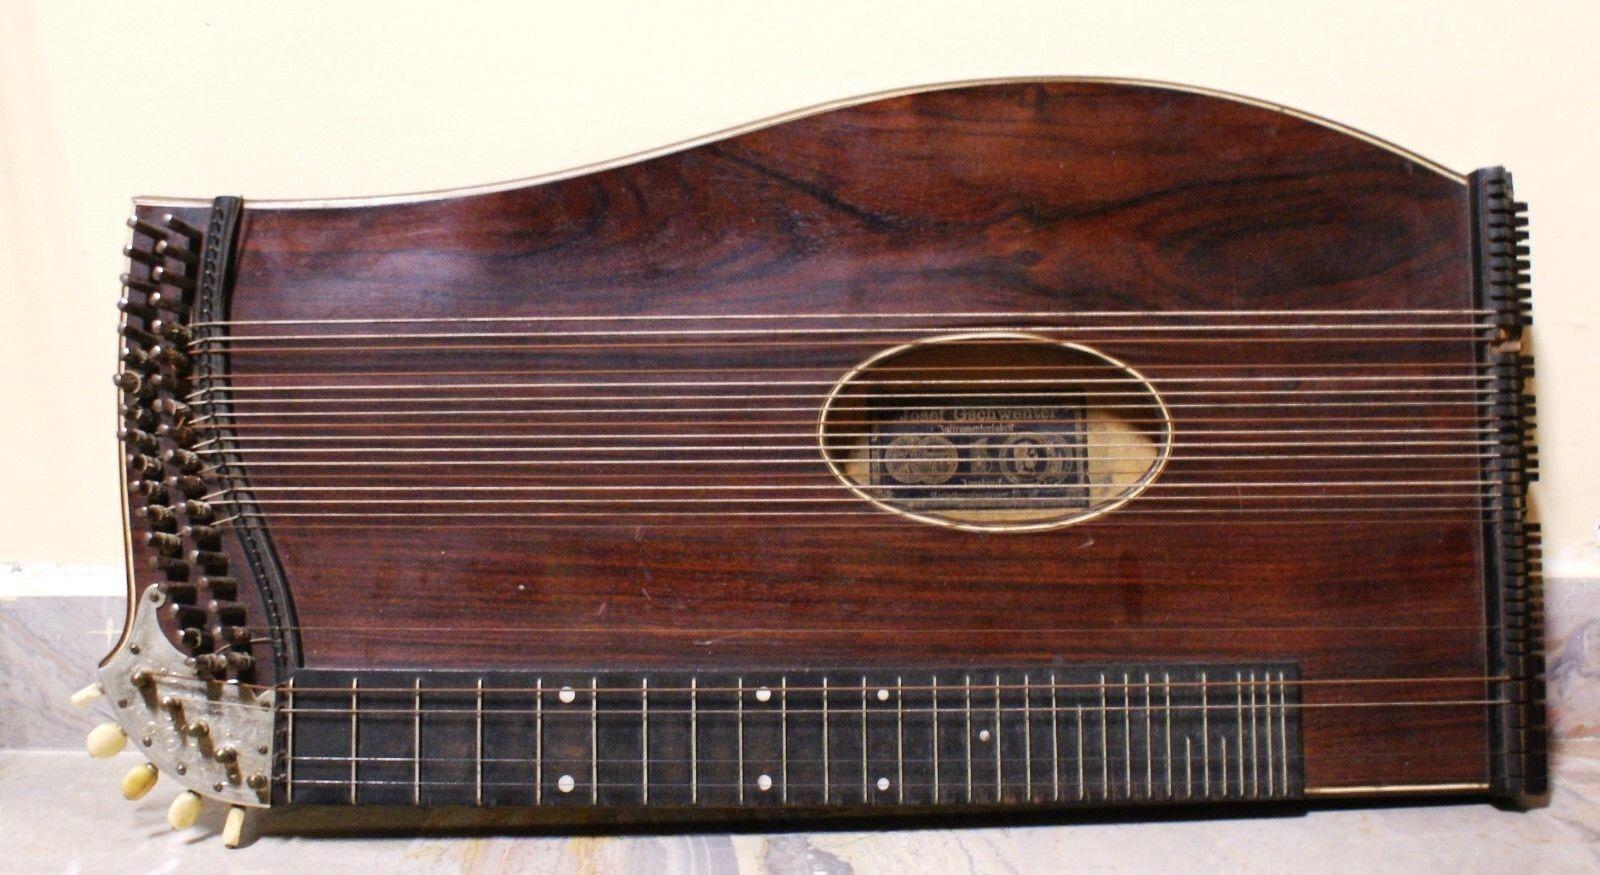 Antico strumento a corda + custodia